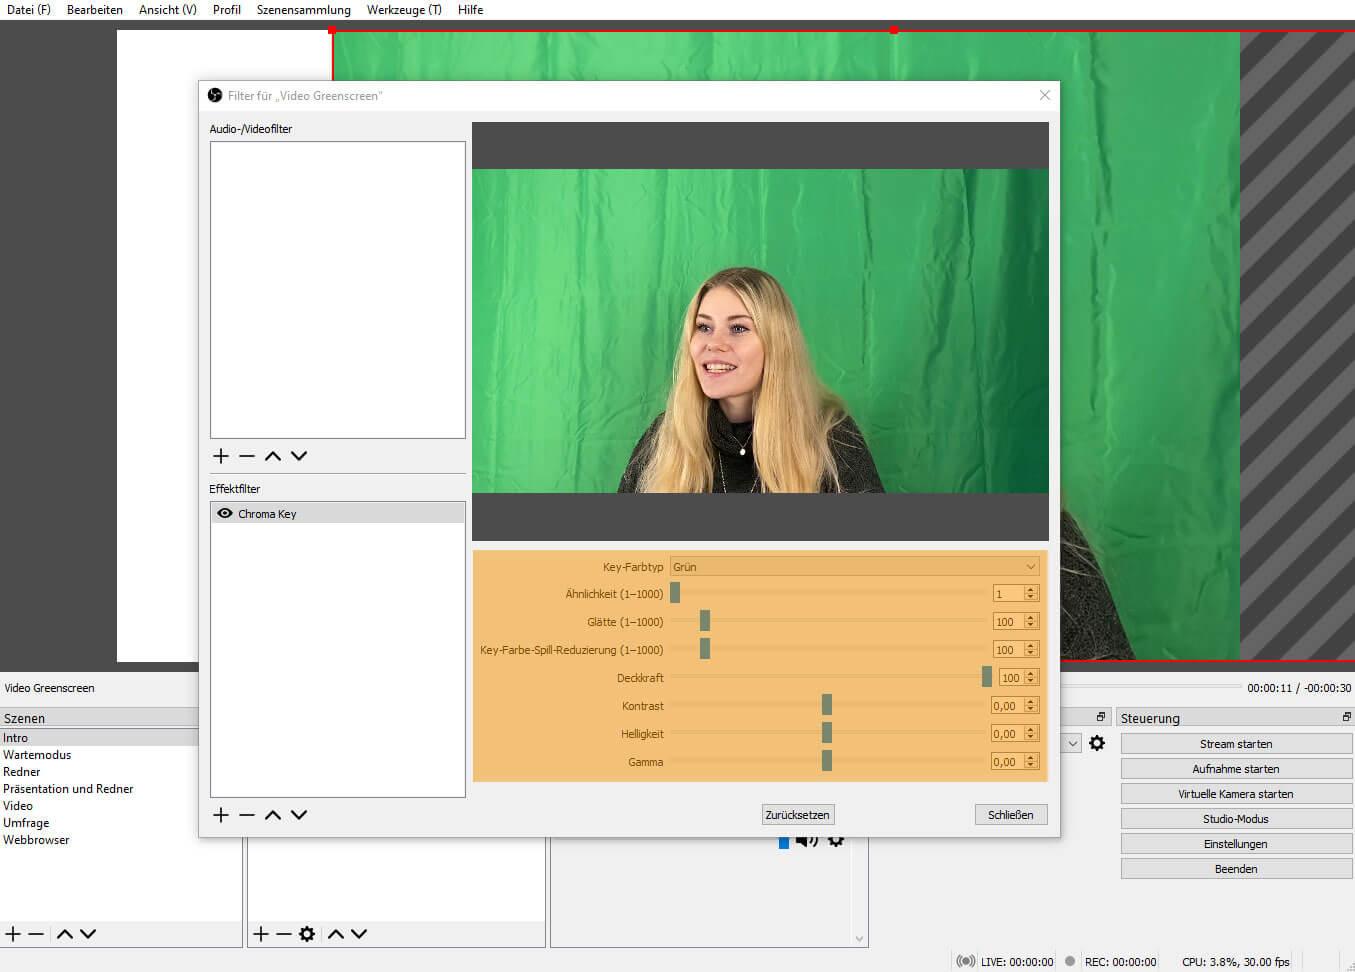 OBS Studio 26.1.1 – Filter Chroma Key für Greenscreen